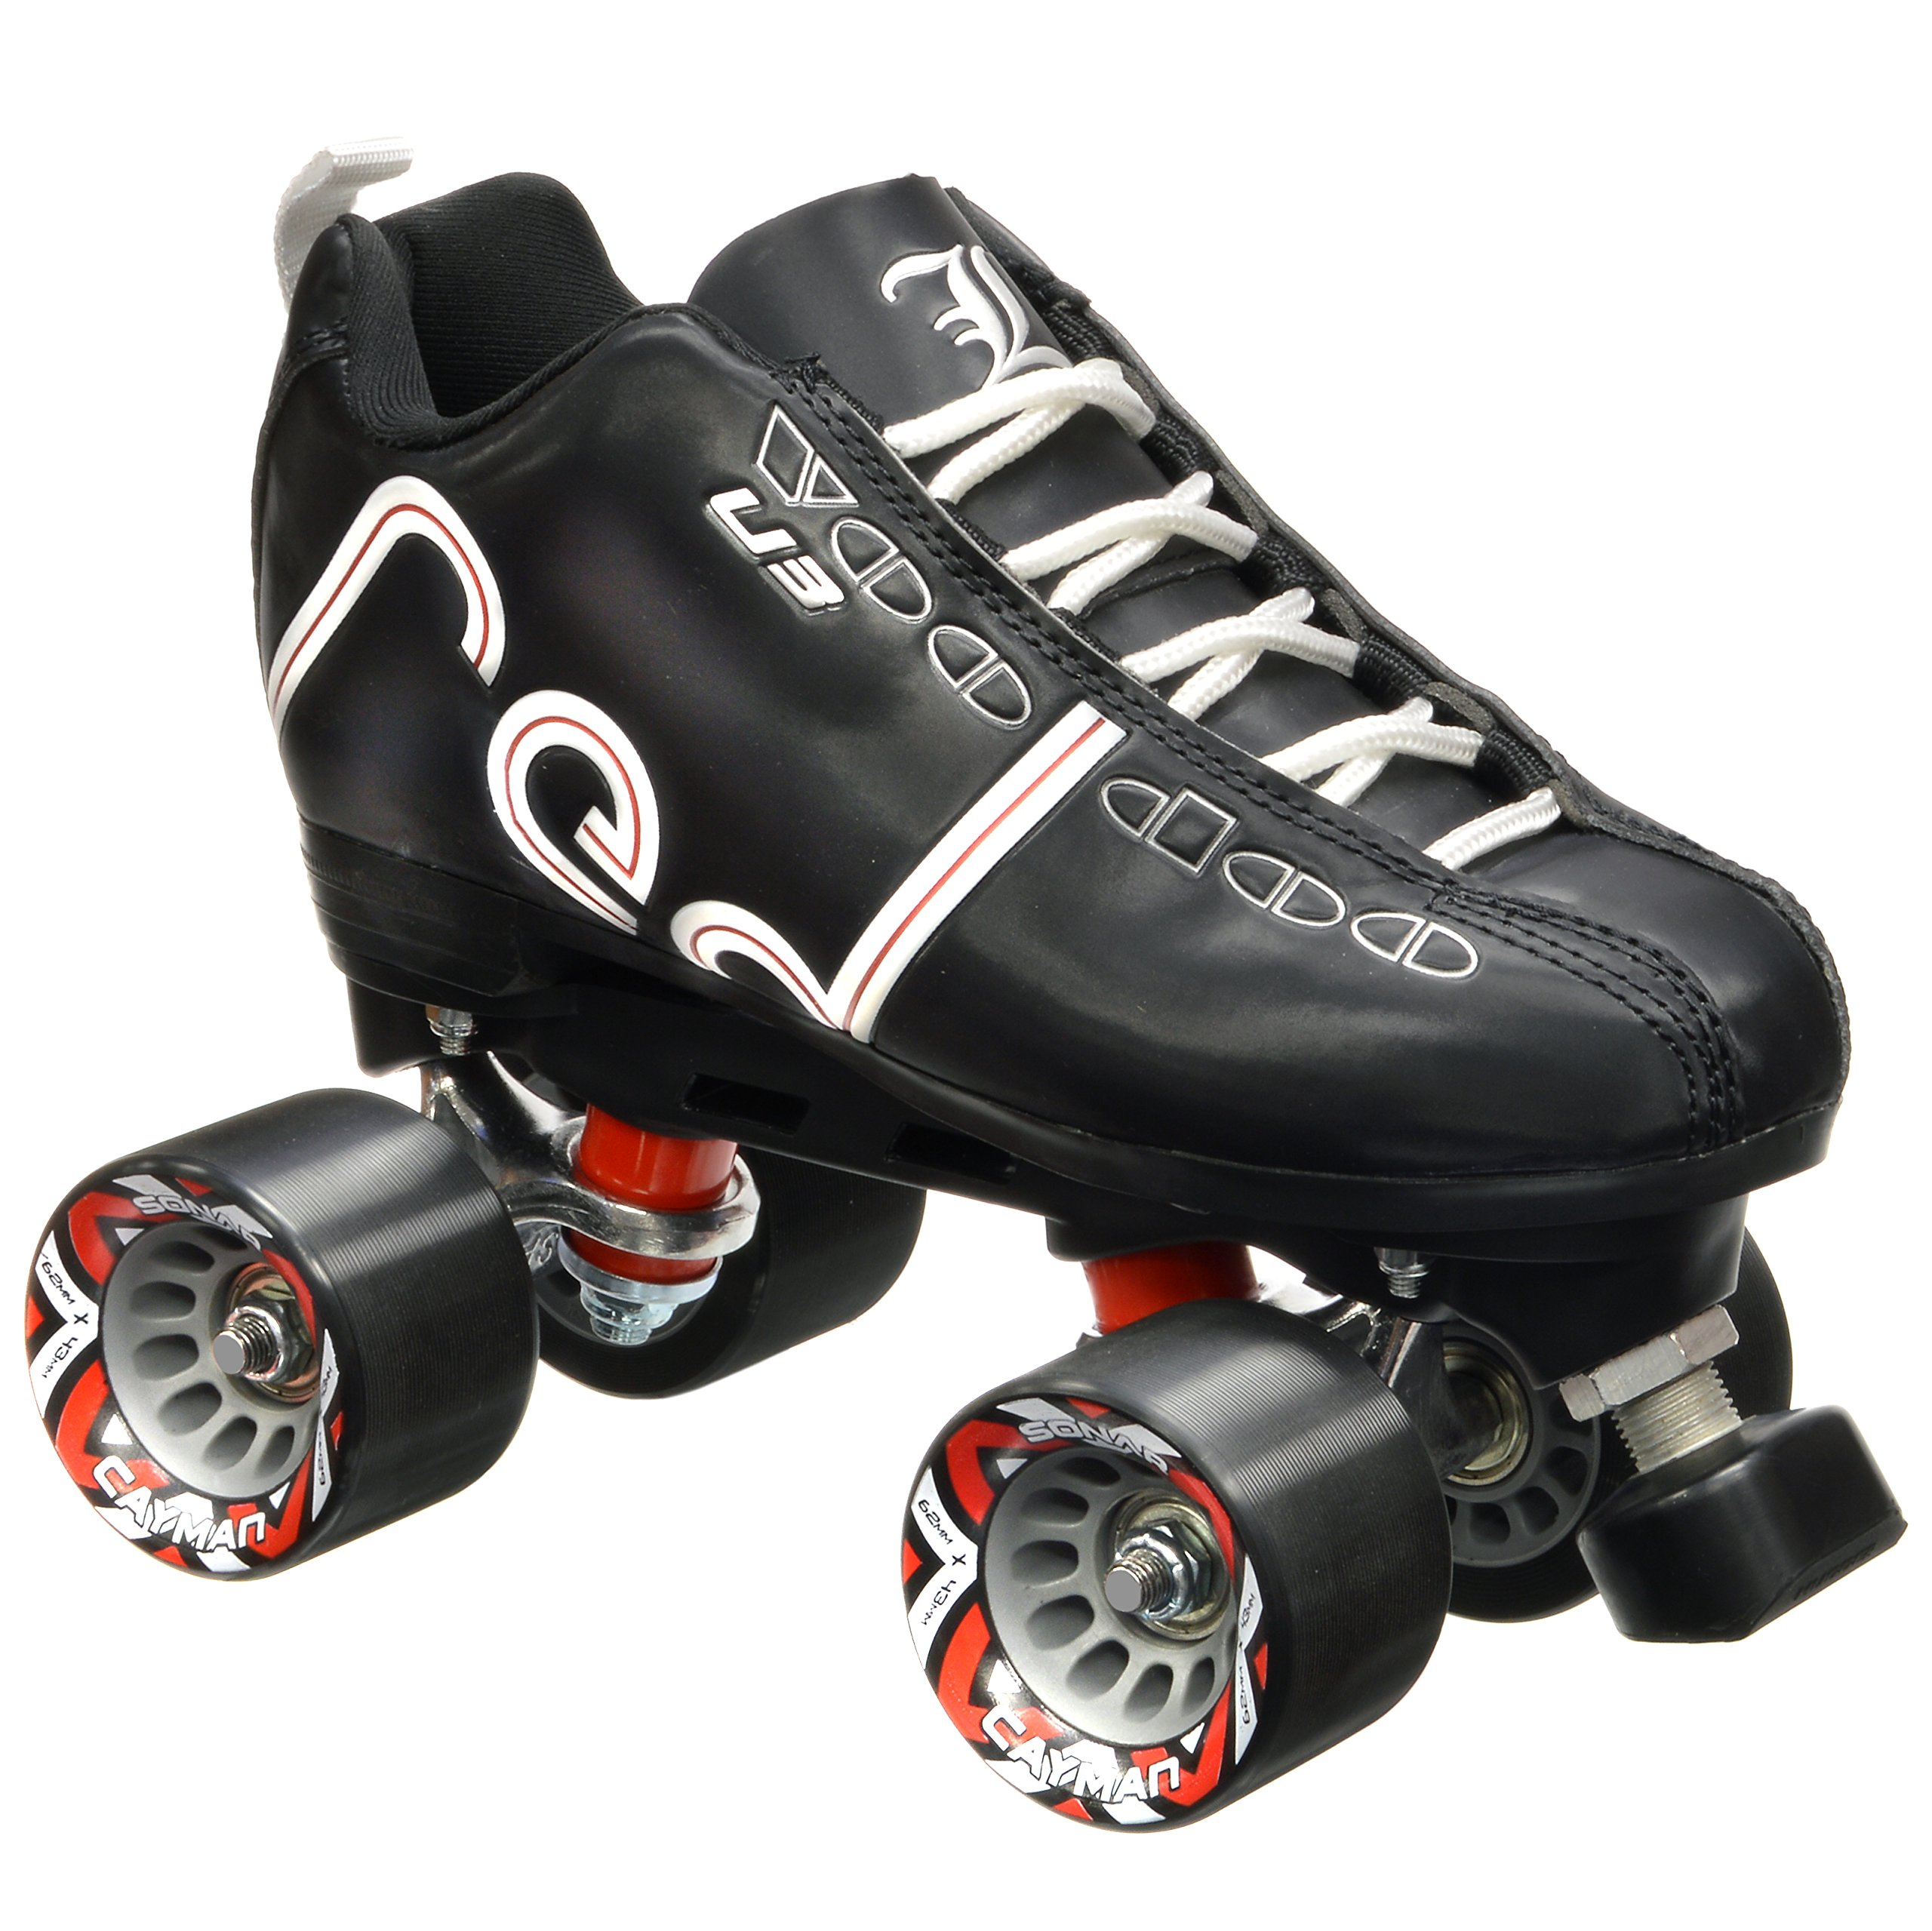 New! Labeda Voodoo U3 Quad Roller Speed Skates Customized Black w/ Black Cayman Wheels! (Mens 5 / Ladies 6)